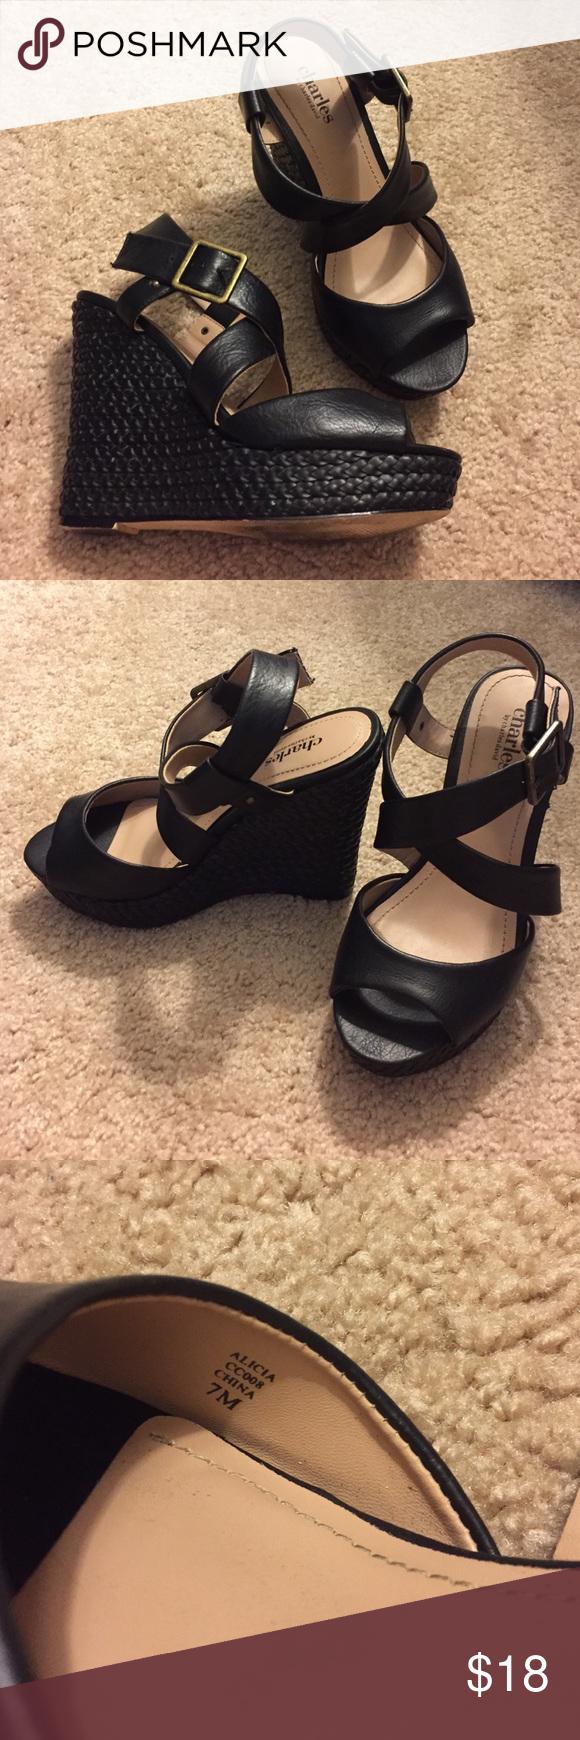 "Charles David Alicia wedges Worn once. Braided wedge and platform in black. 5"" heel with 1.25"" platform. Charles David Shoes Wedges"